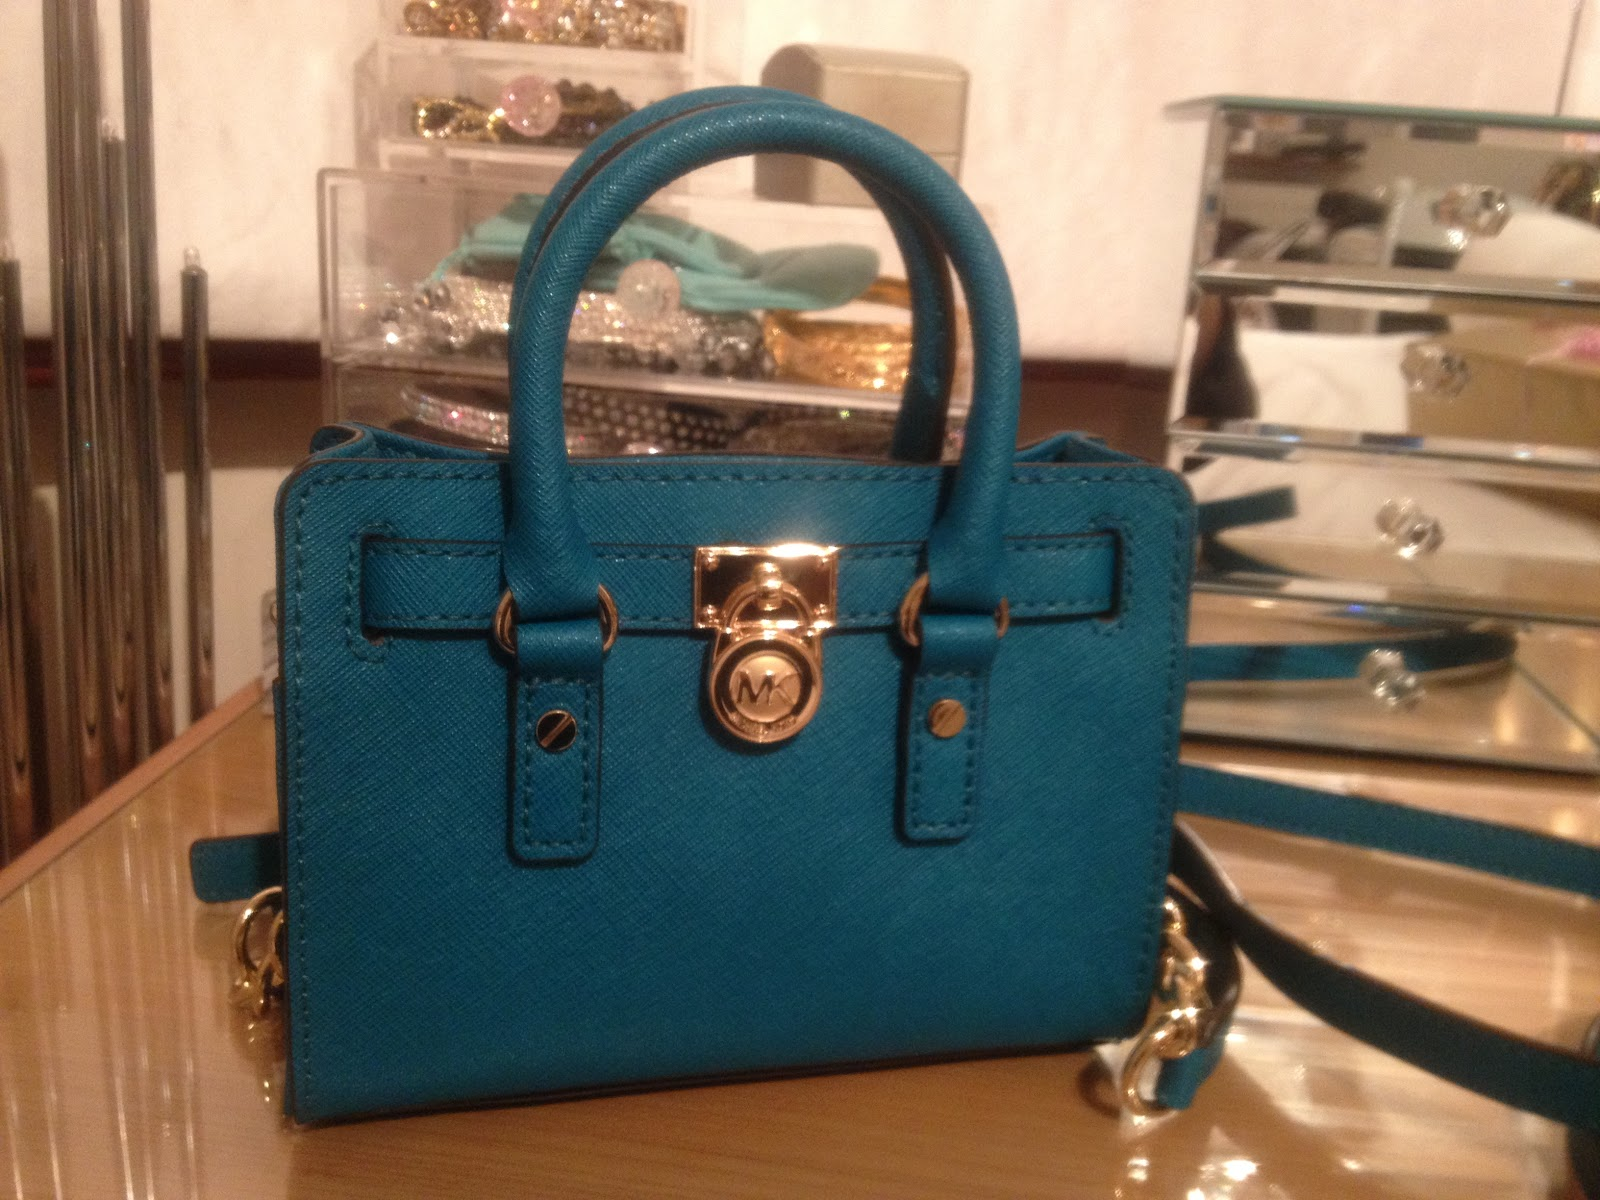 House Of Fraser Michael Kors Handbags Handbag Reviews 2018